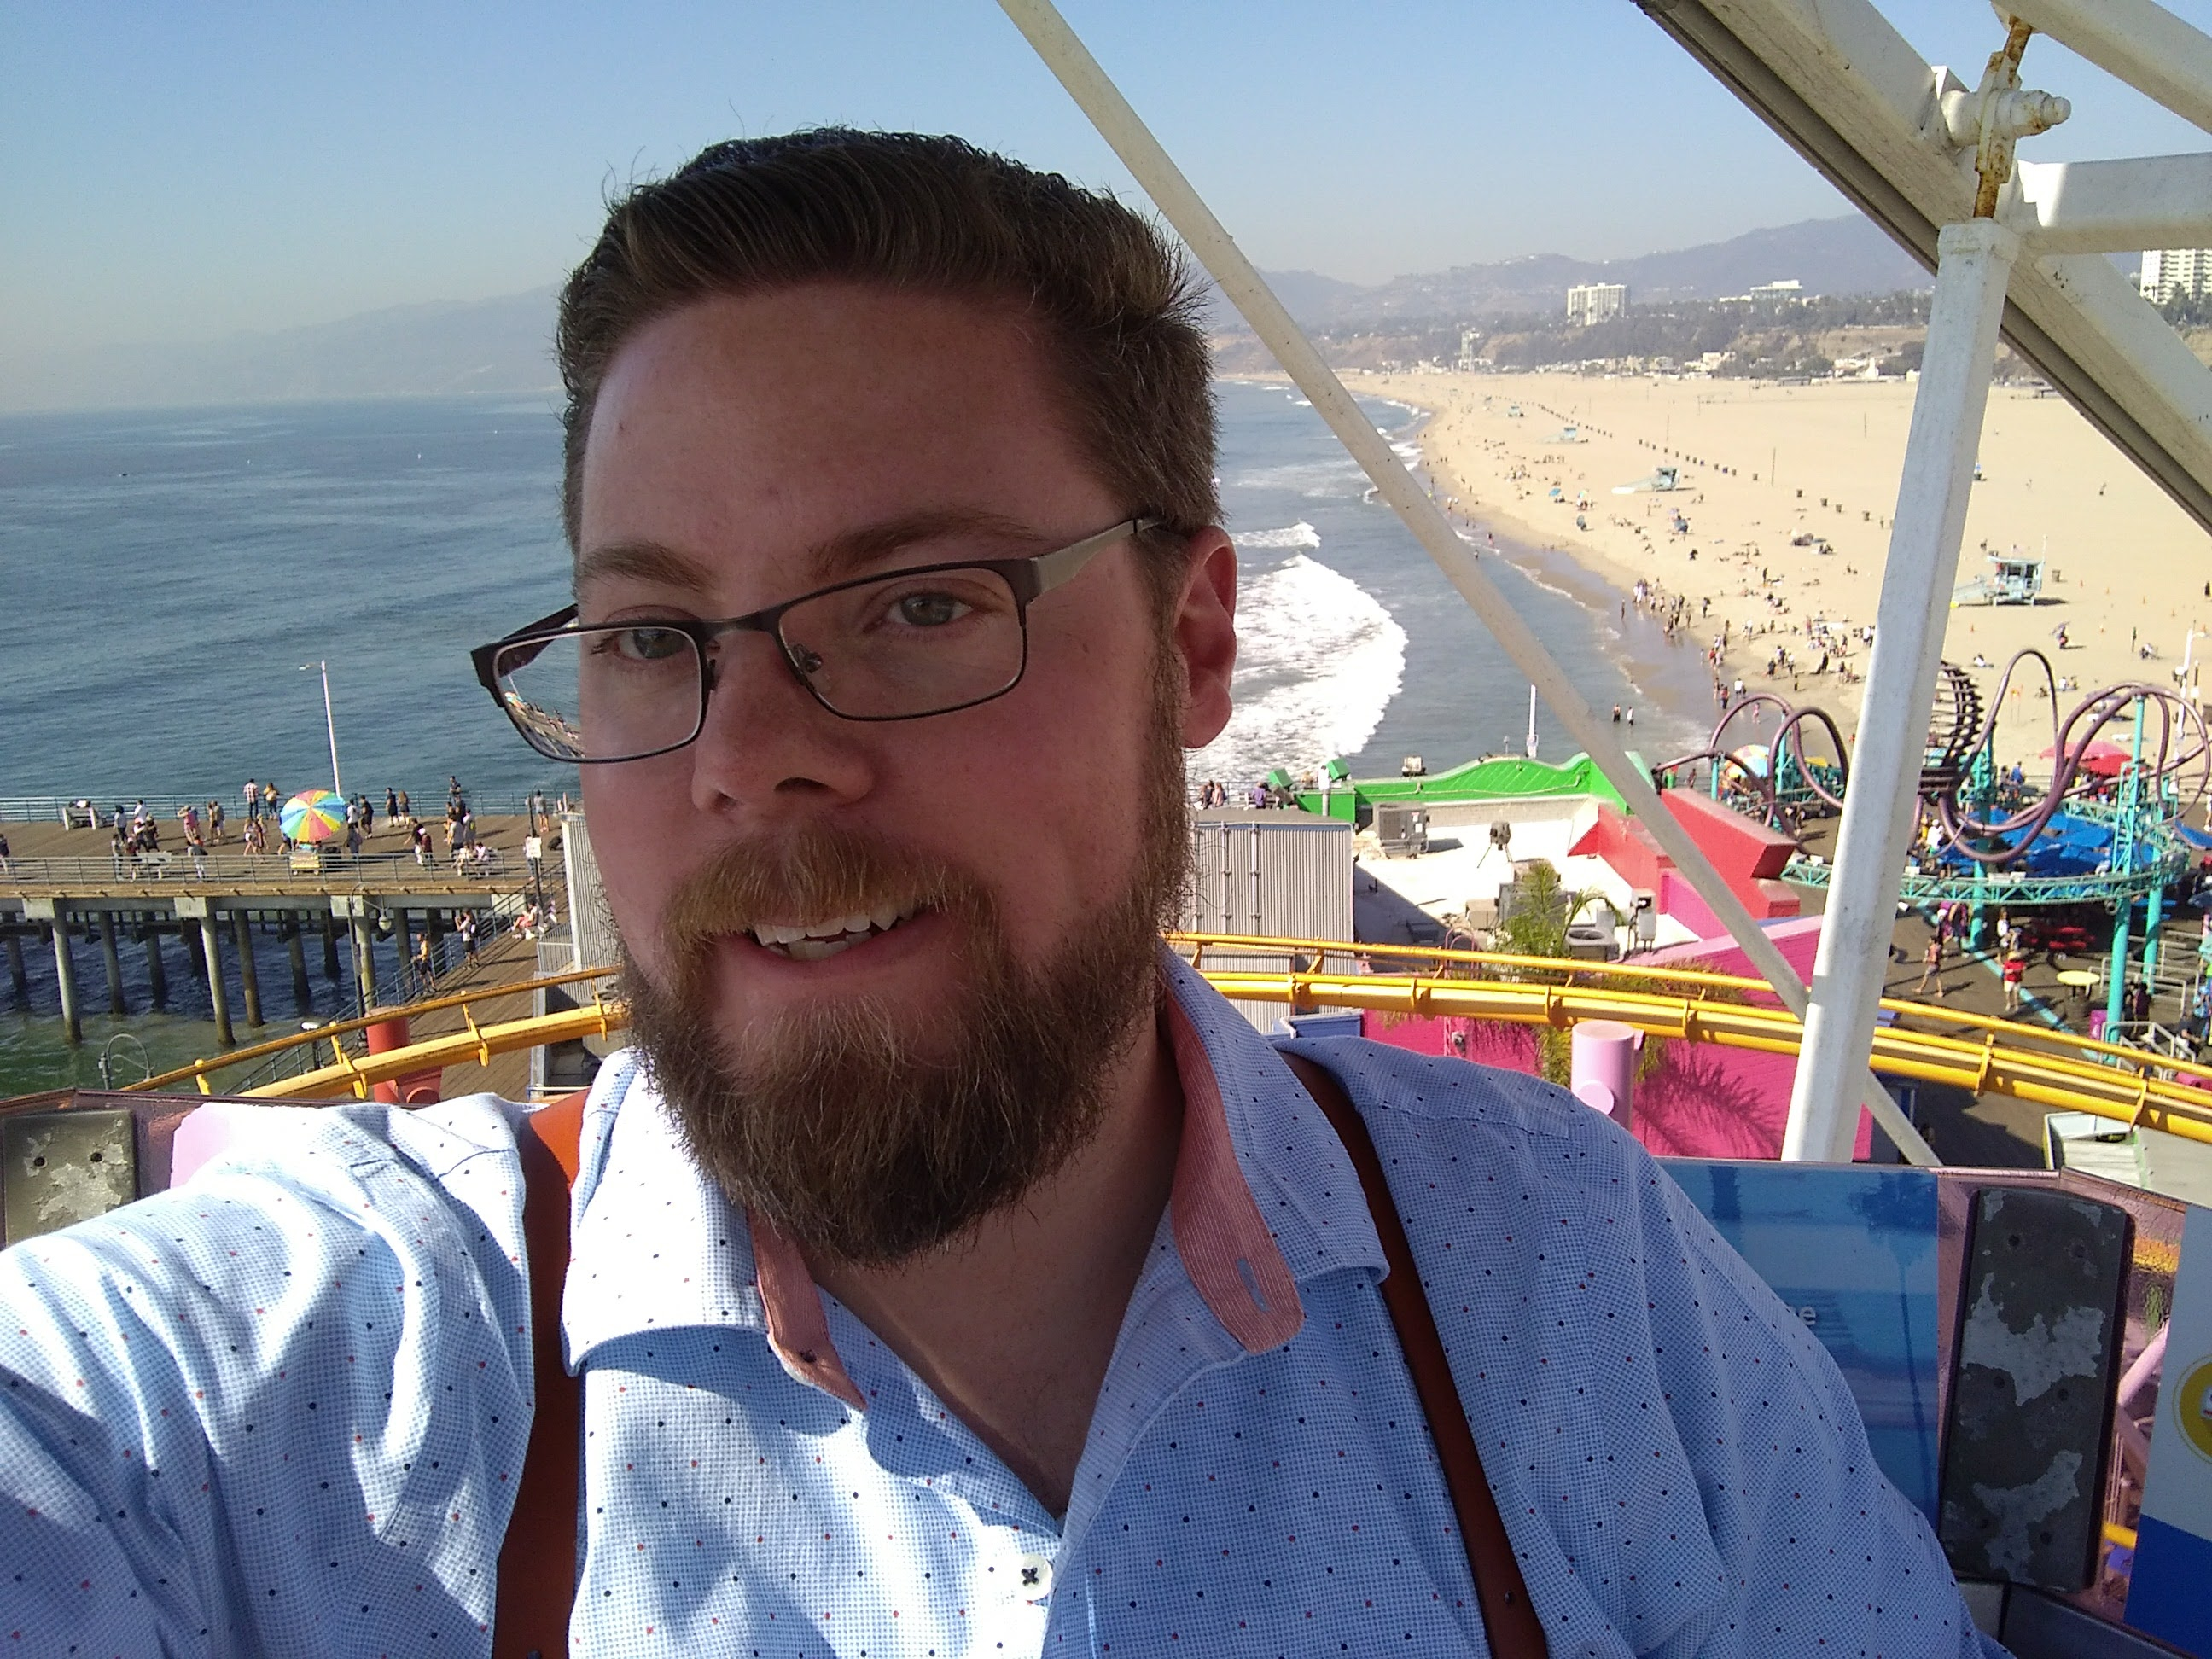 Me on Ferris Wheel